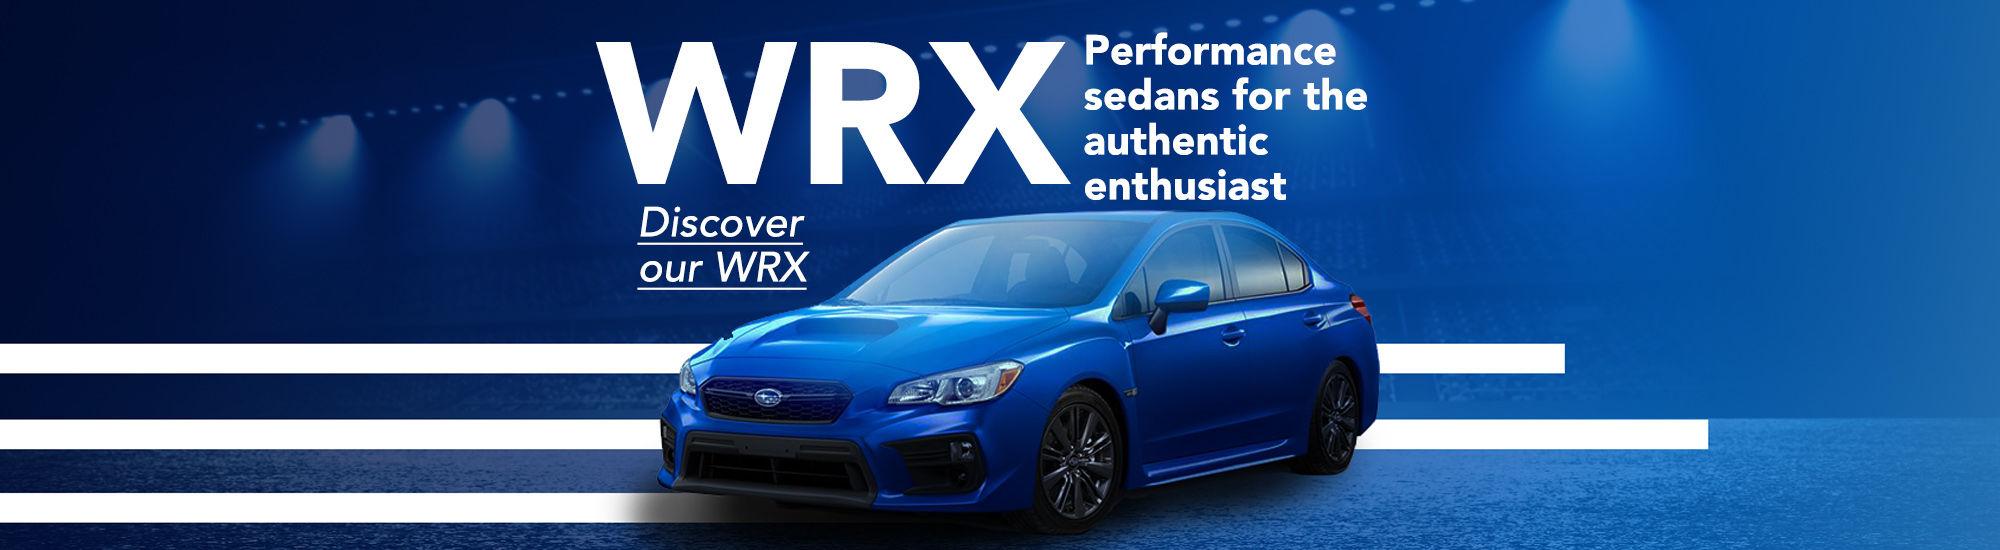 2019 WRX